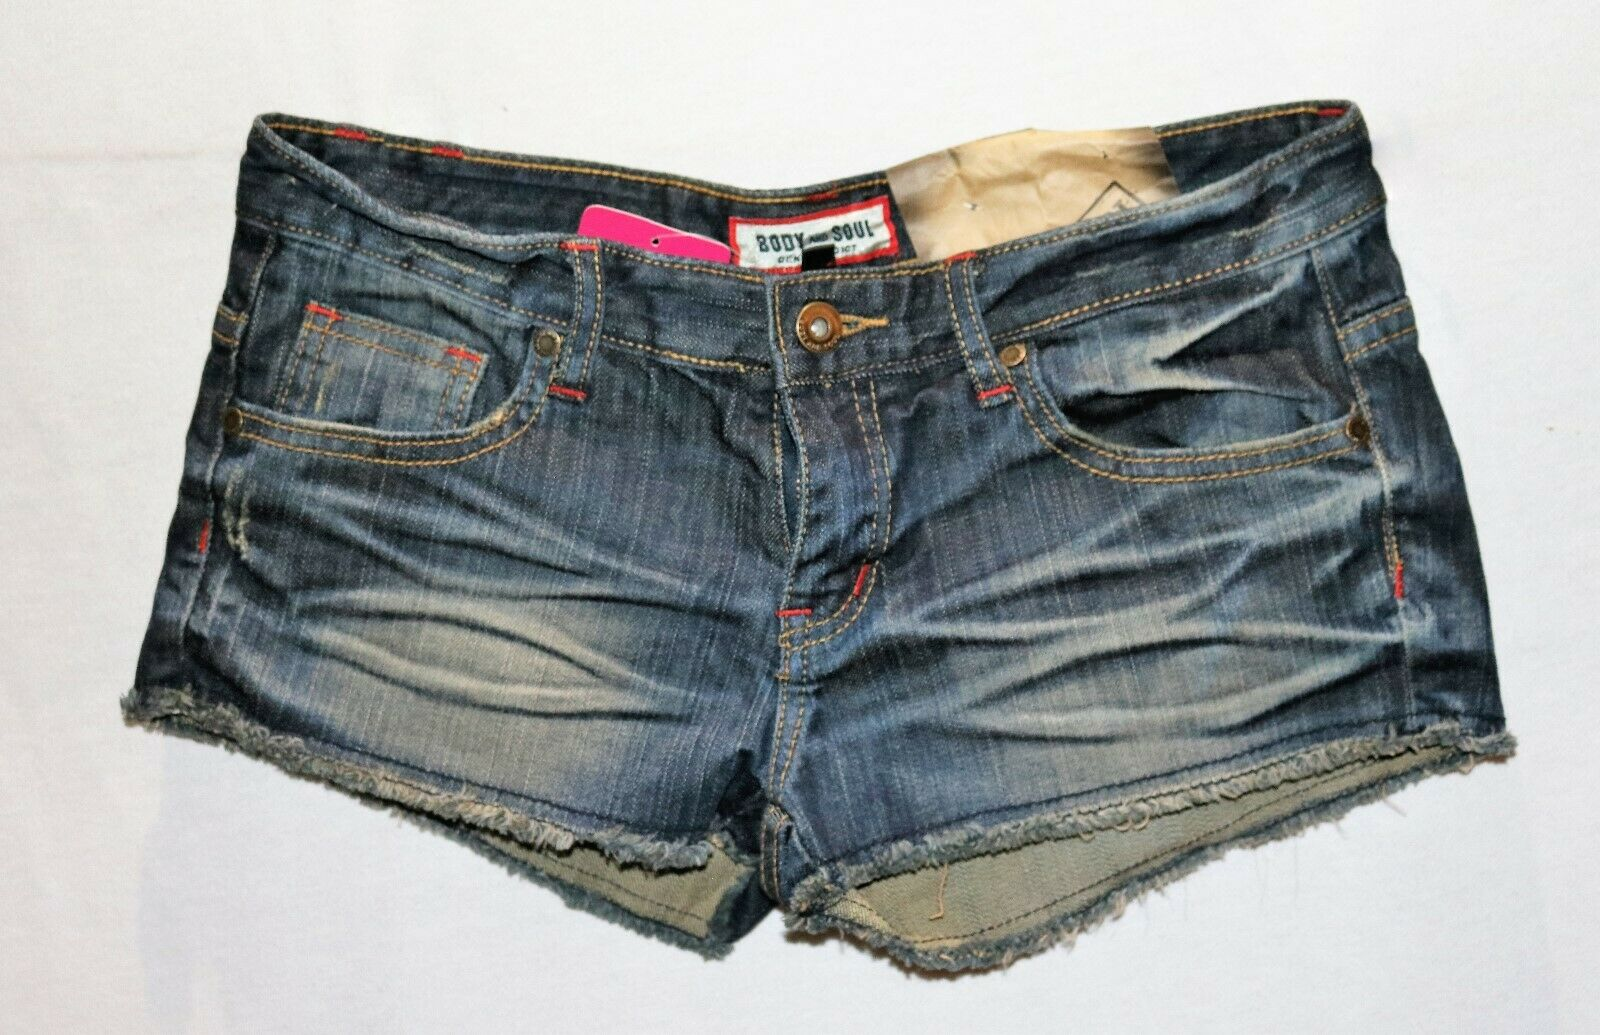 Body & Soul Brand bluee Denim Cut Off Shorts Size S BNWT  TQ64